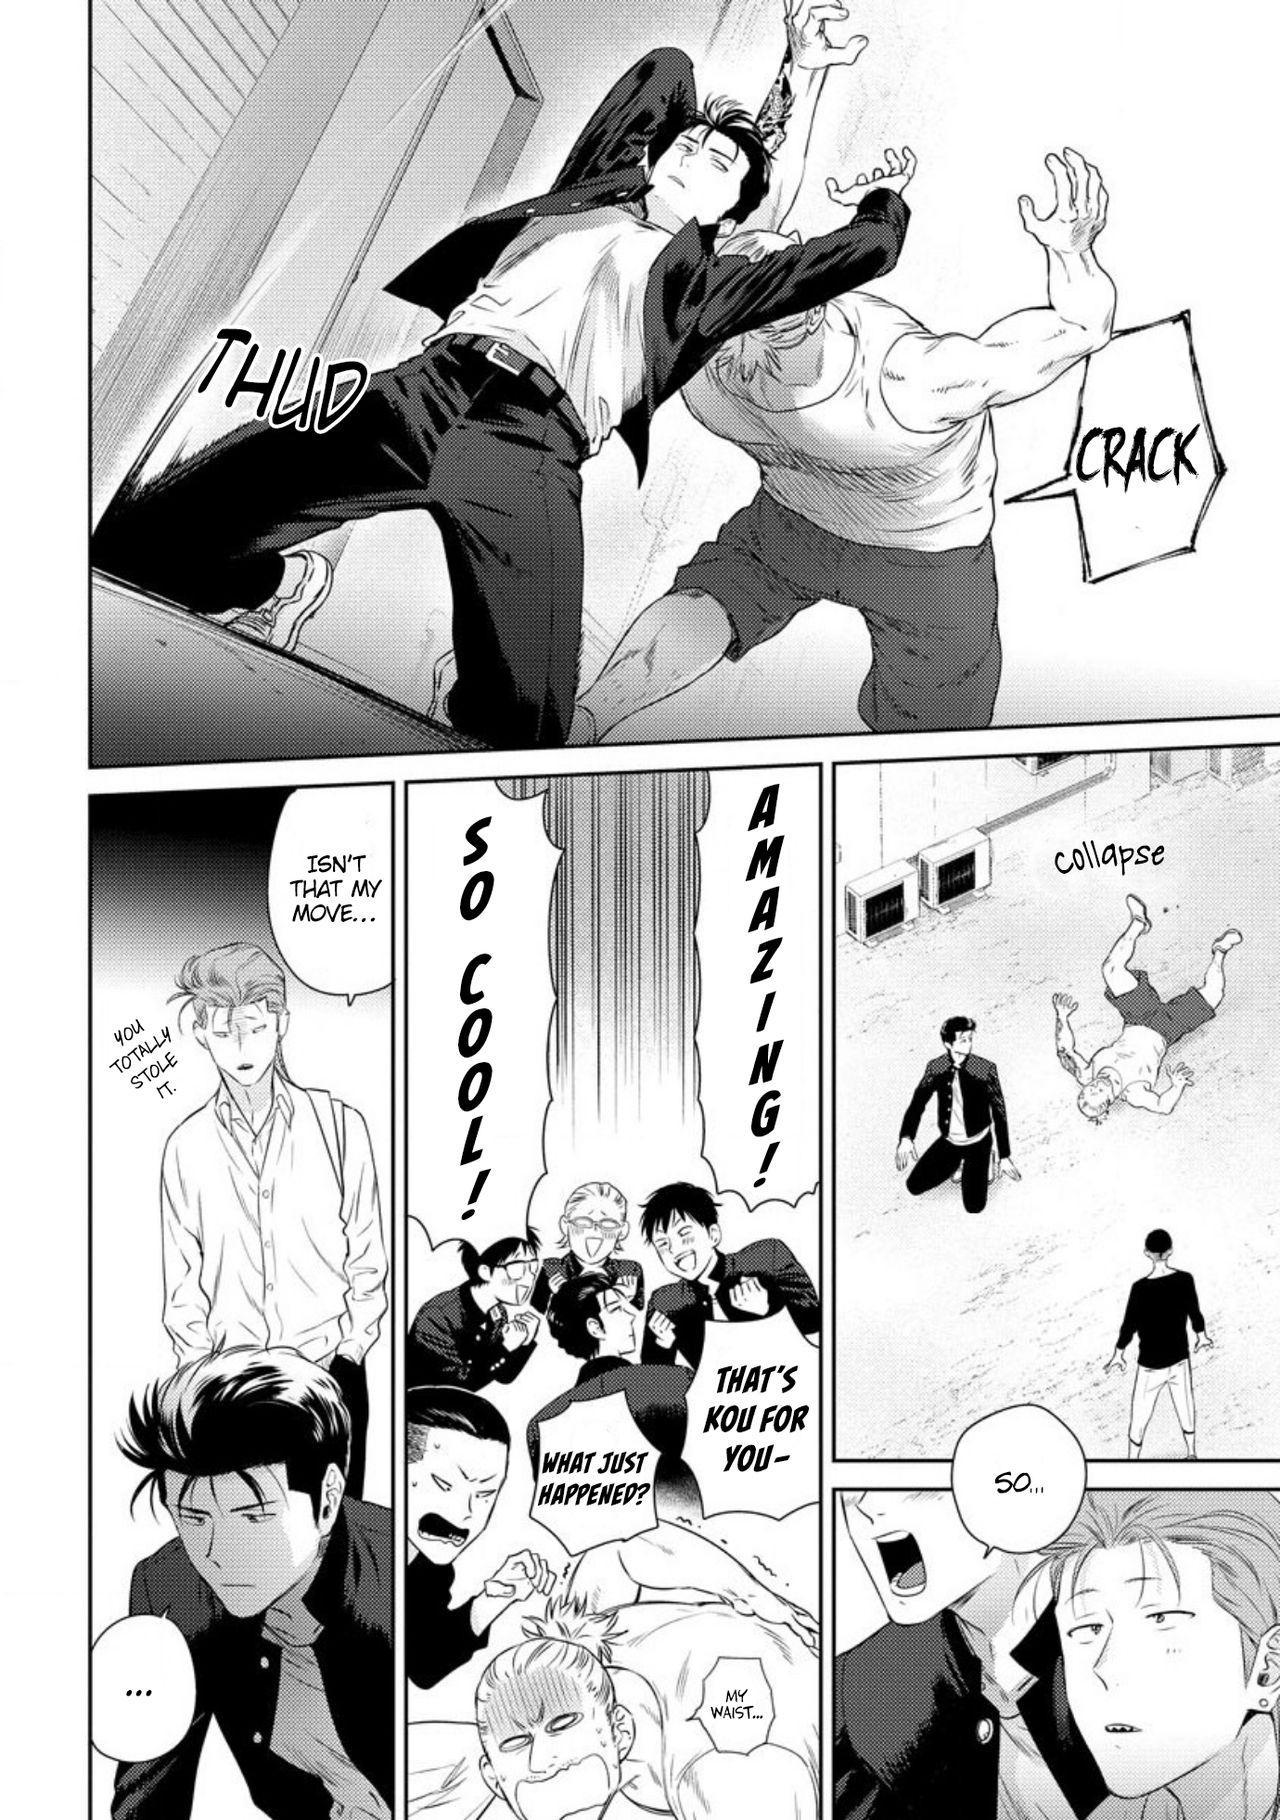 [Hiiragi Nozomu] Nakasete Yaru yo Yankee-kun   I'll Make You Cry Ch. 1-5 + Extras [English] [Digital] 94